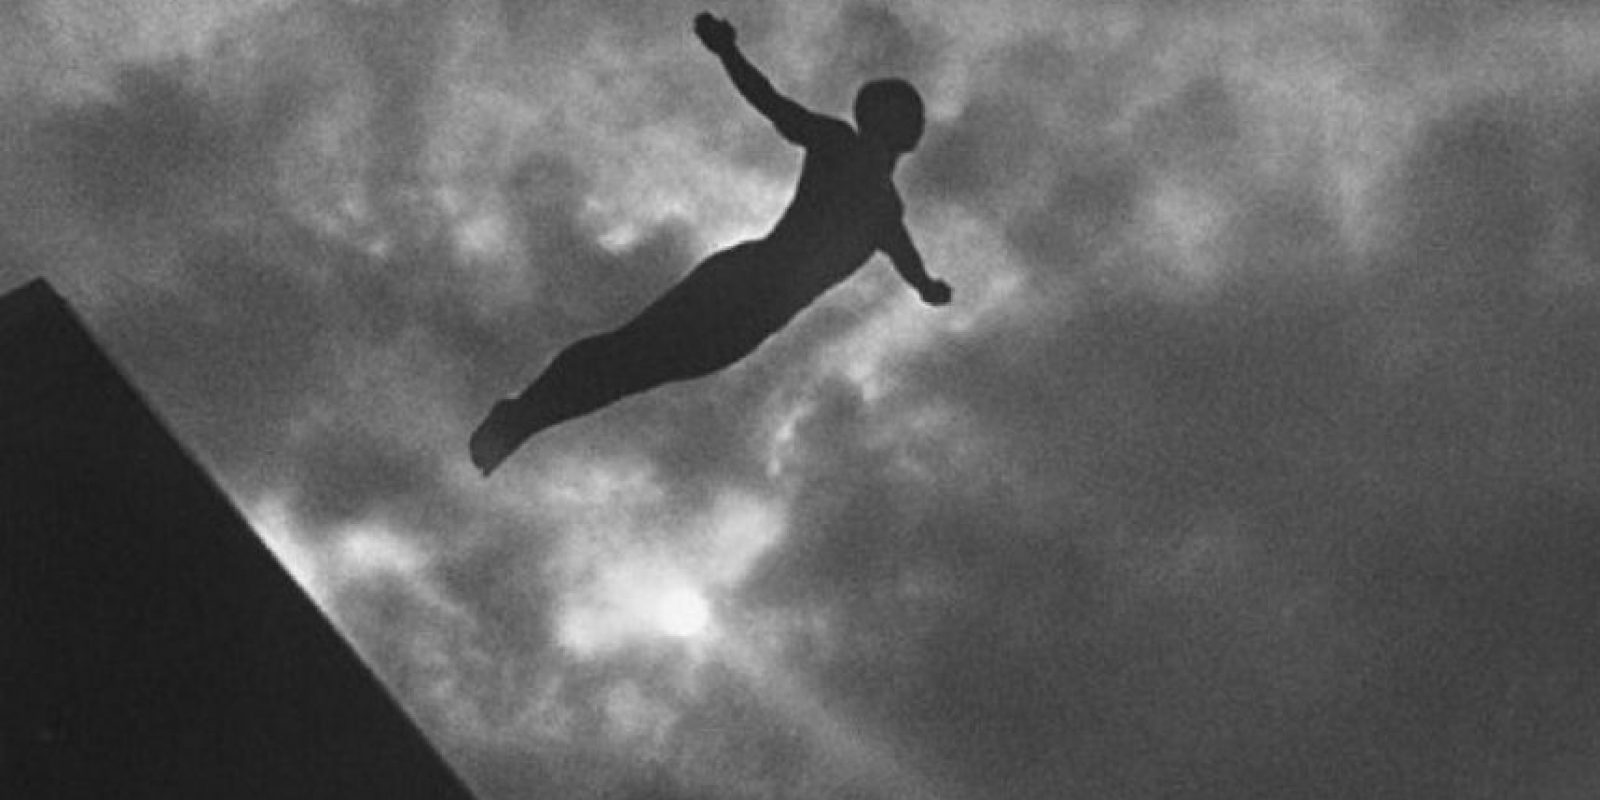 """Algunas ocasiones puede ocurrir que nos despertemos repetidas veces a causa de espasmos nocturnos"". Foto:Pinterest"